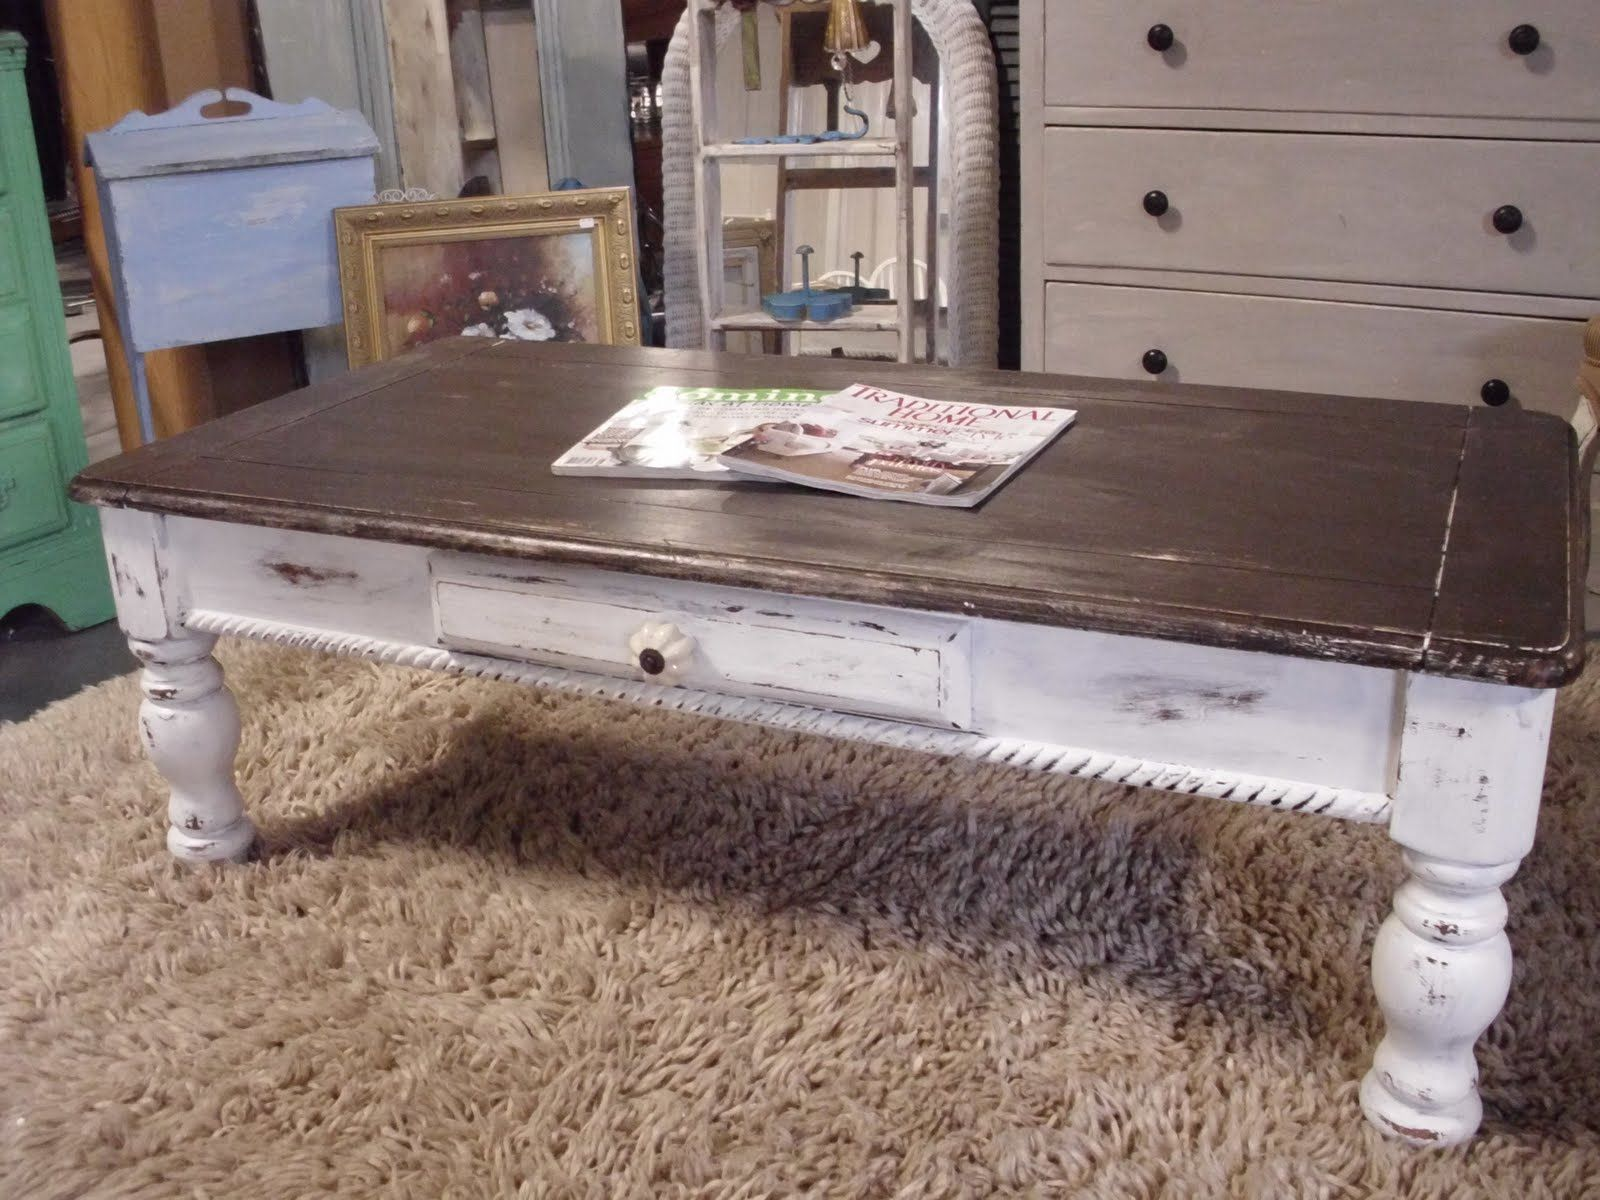 20 Rustic Distressed Coffee Table Home fice Furniture Desk